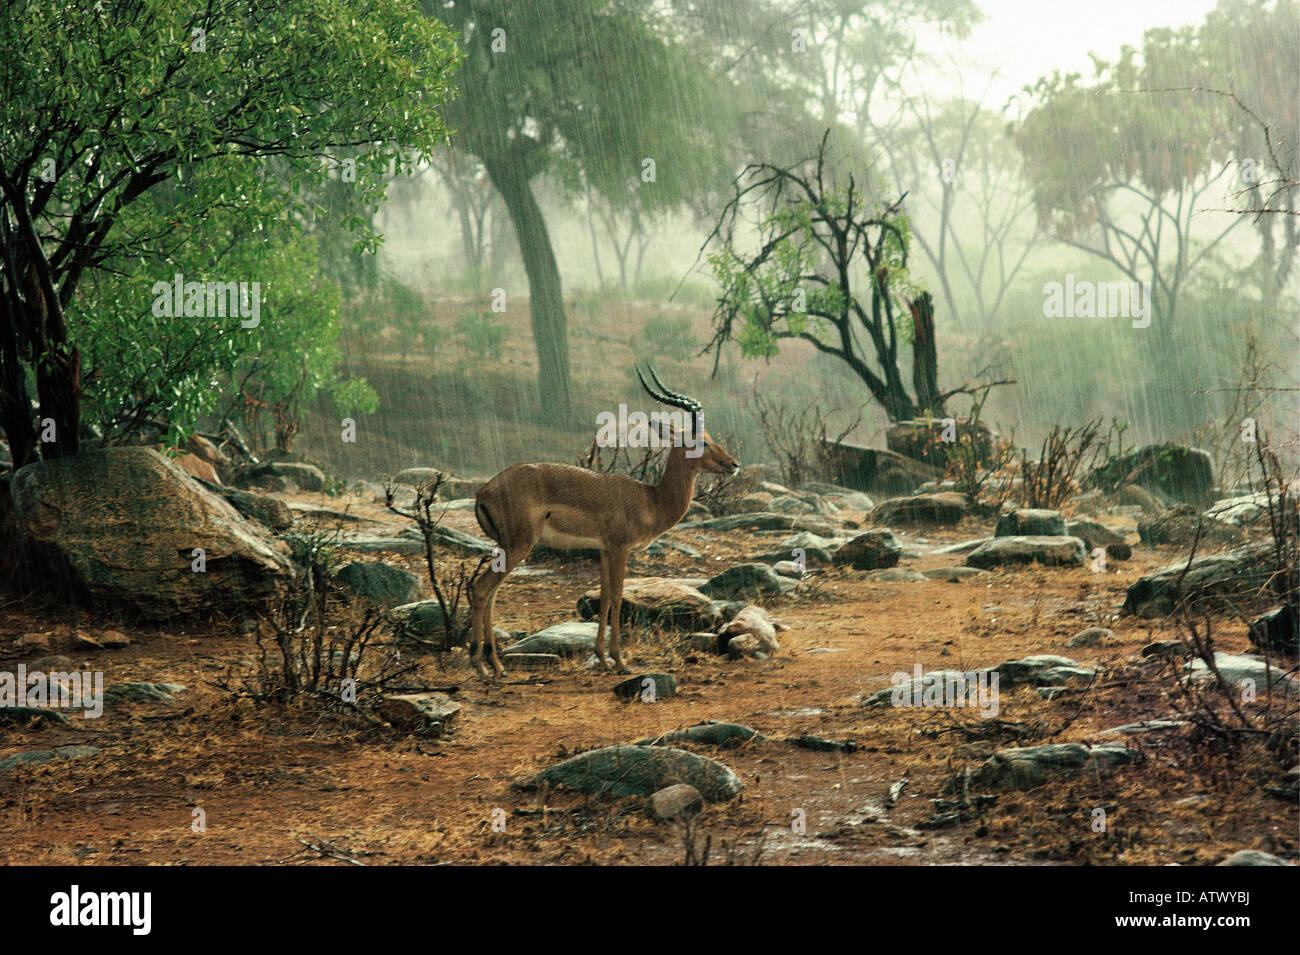 Male Impala antelope standing motionless in a heavy rain shower Tsavo West National Park Kenya East Africa - Stock Image